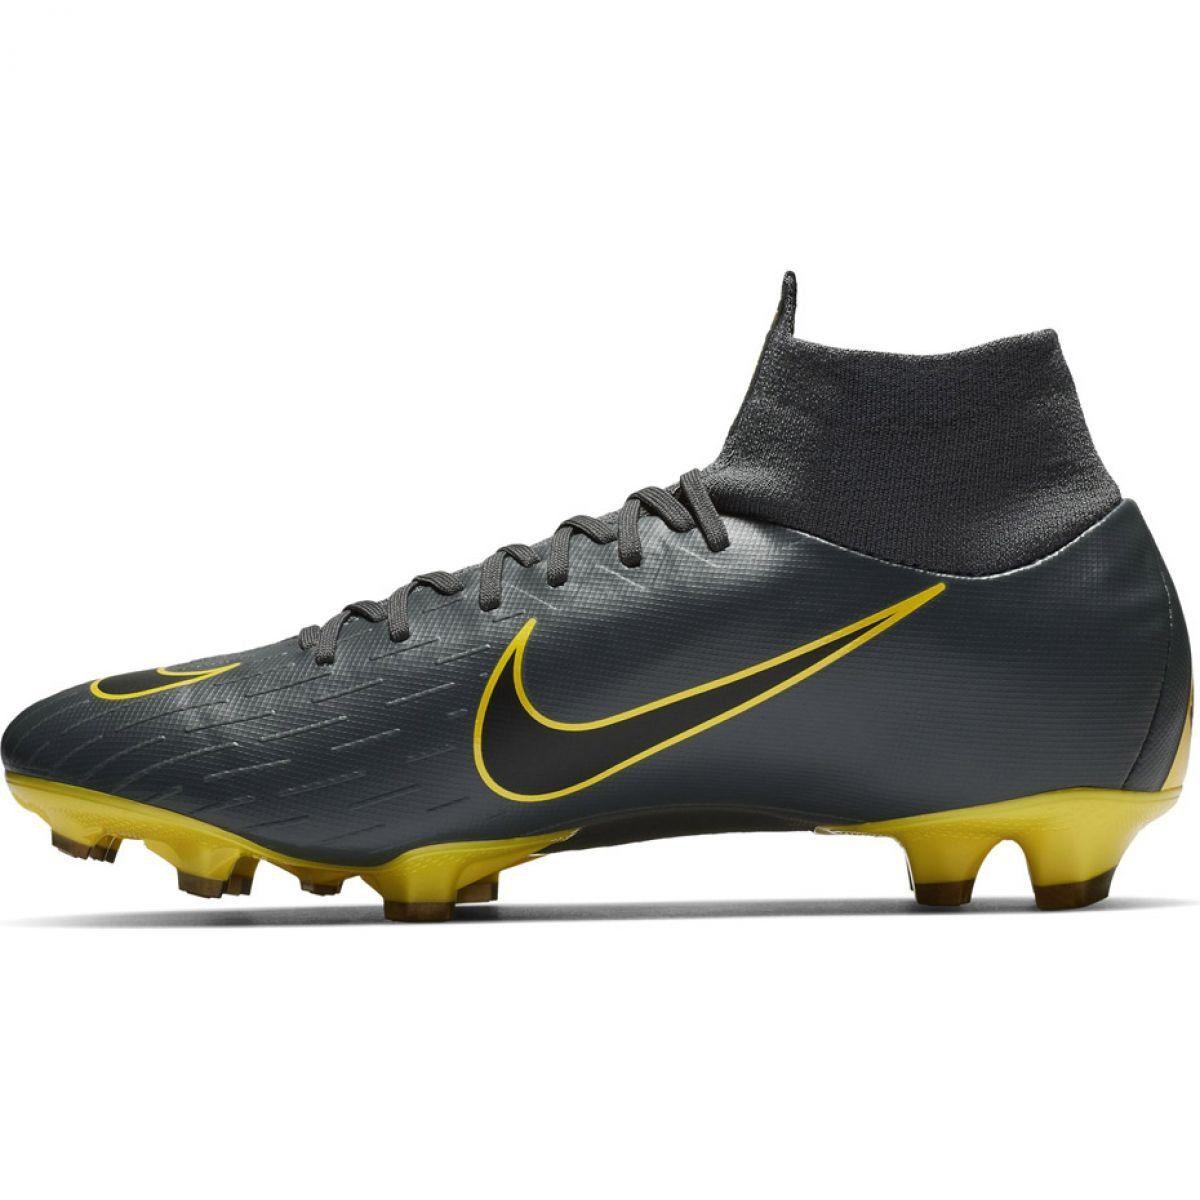 Korki Pilka Nozna Sport Nike Buty Pilkarskie Nike Mercurial Superfly 6 Pro Fg M Ah7368 070 Football Shoes Nike Superfly